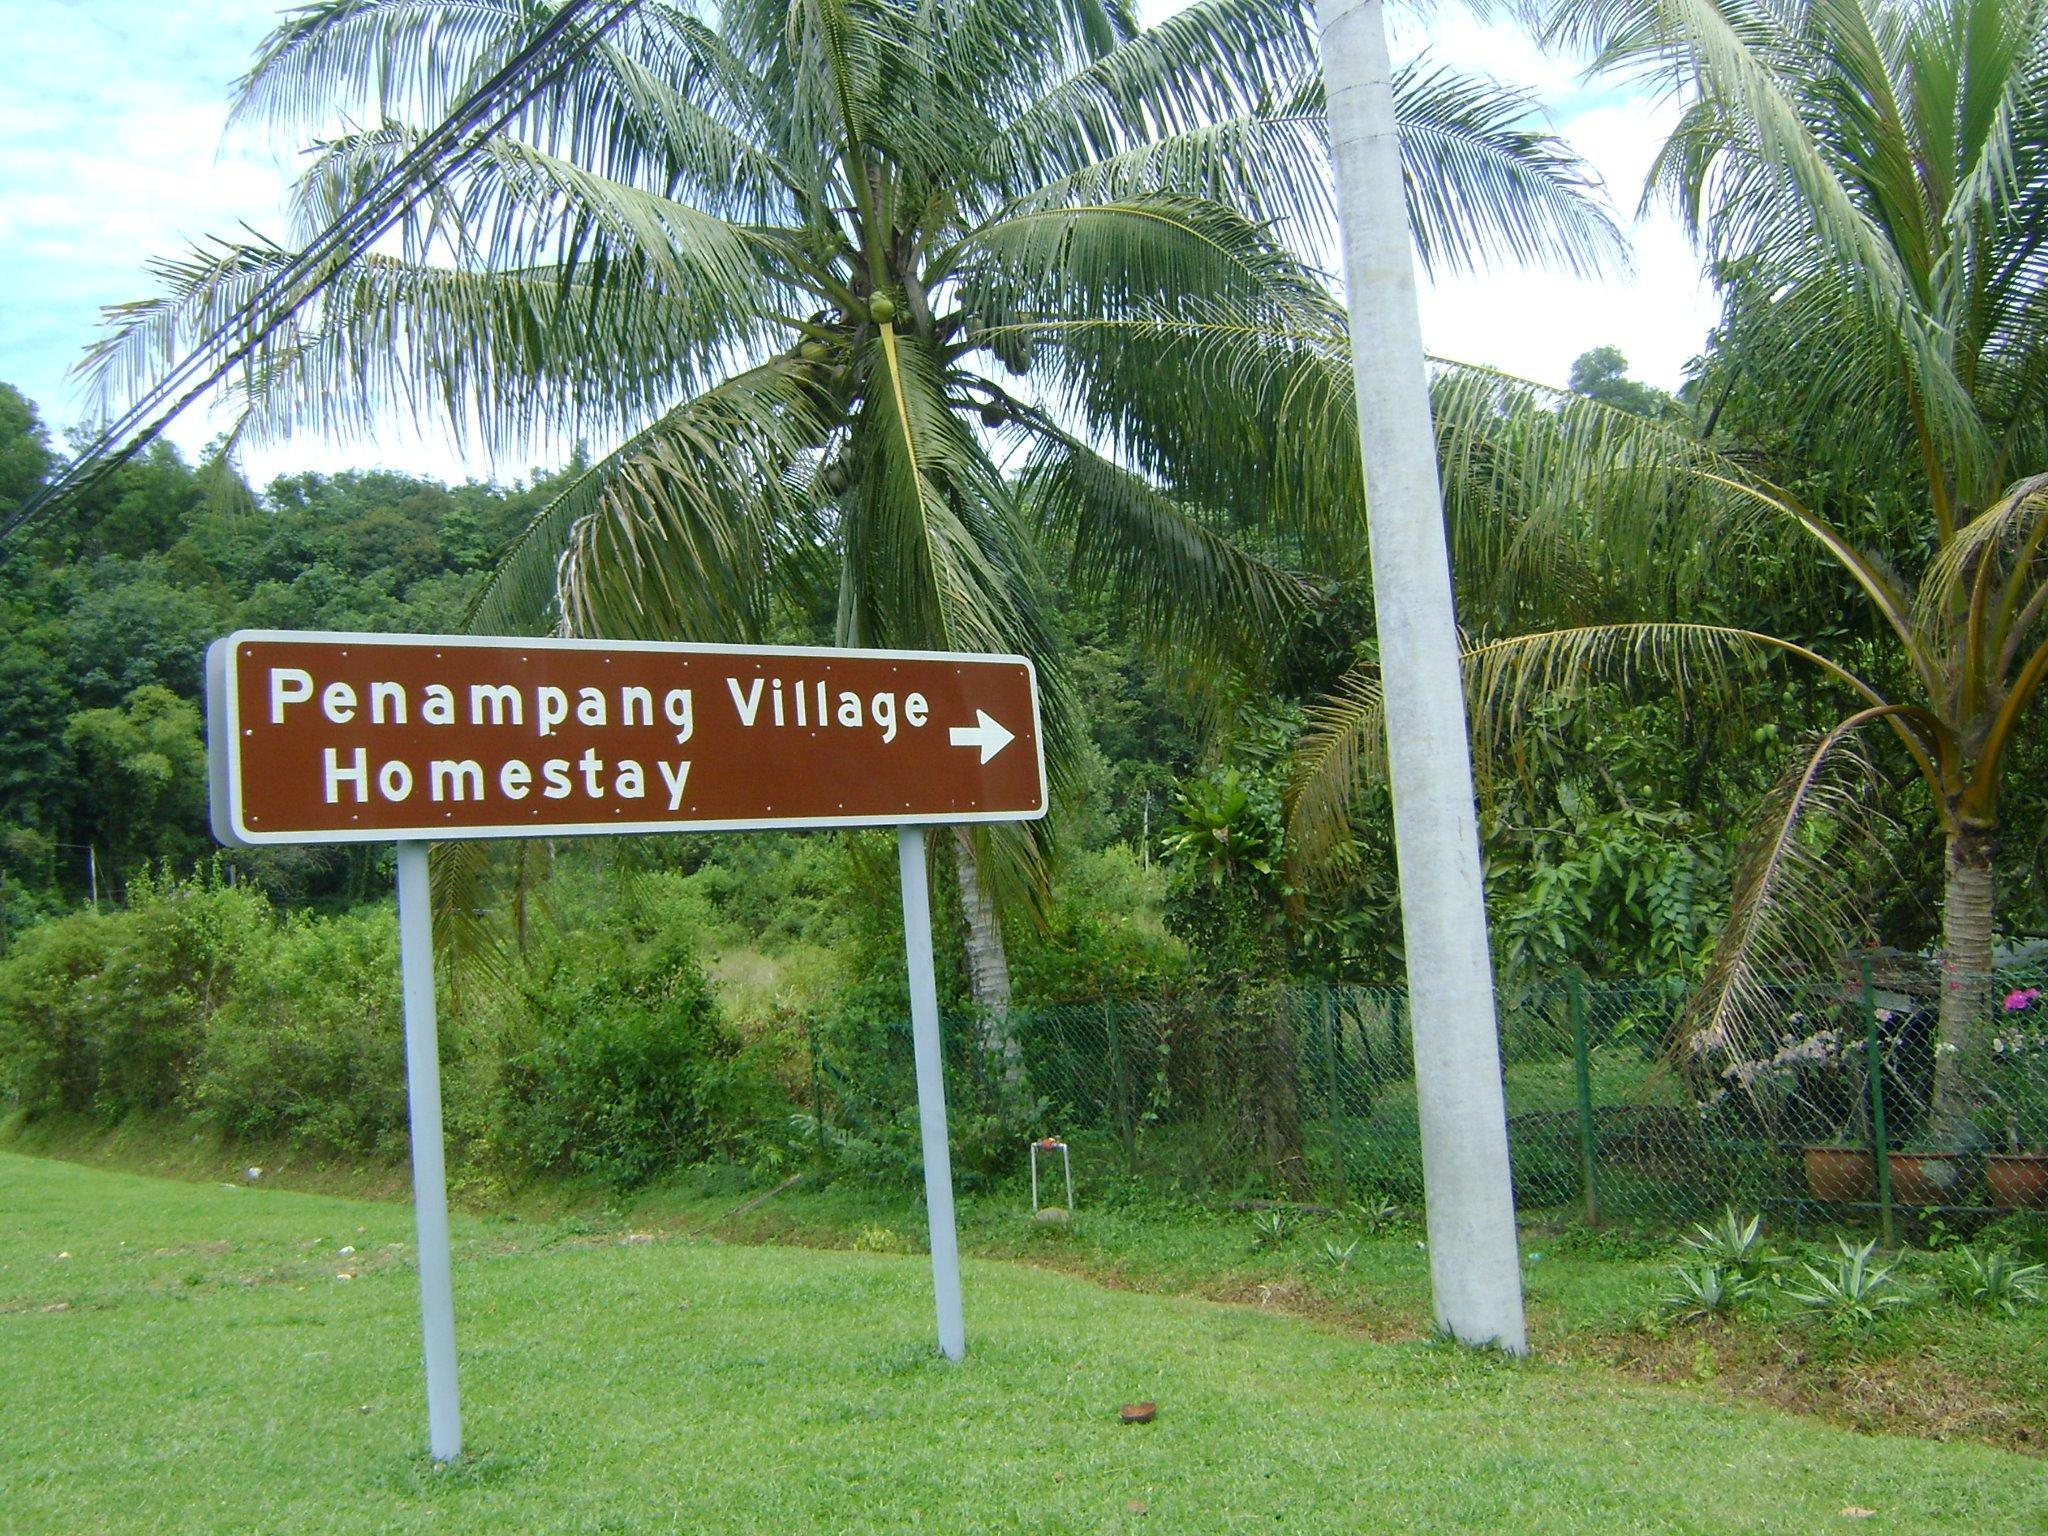 Penampang Village Homestay